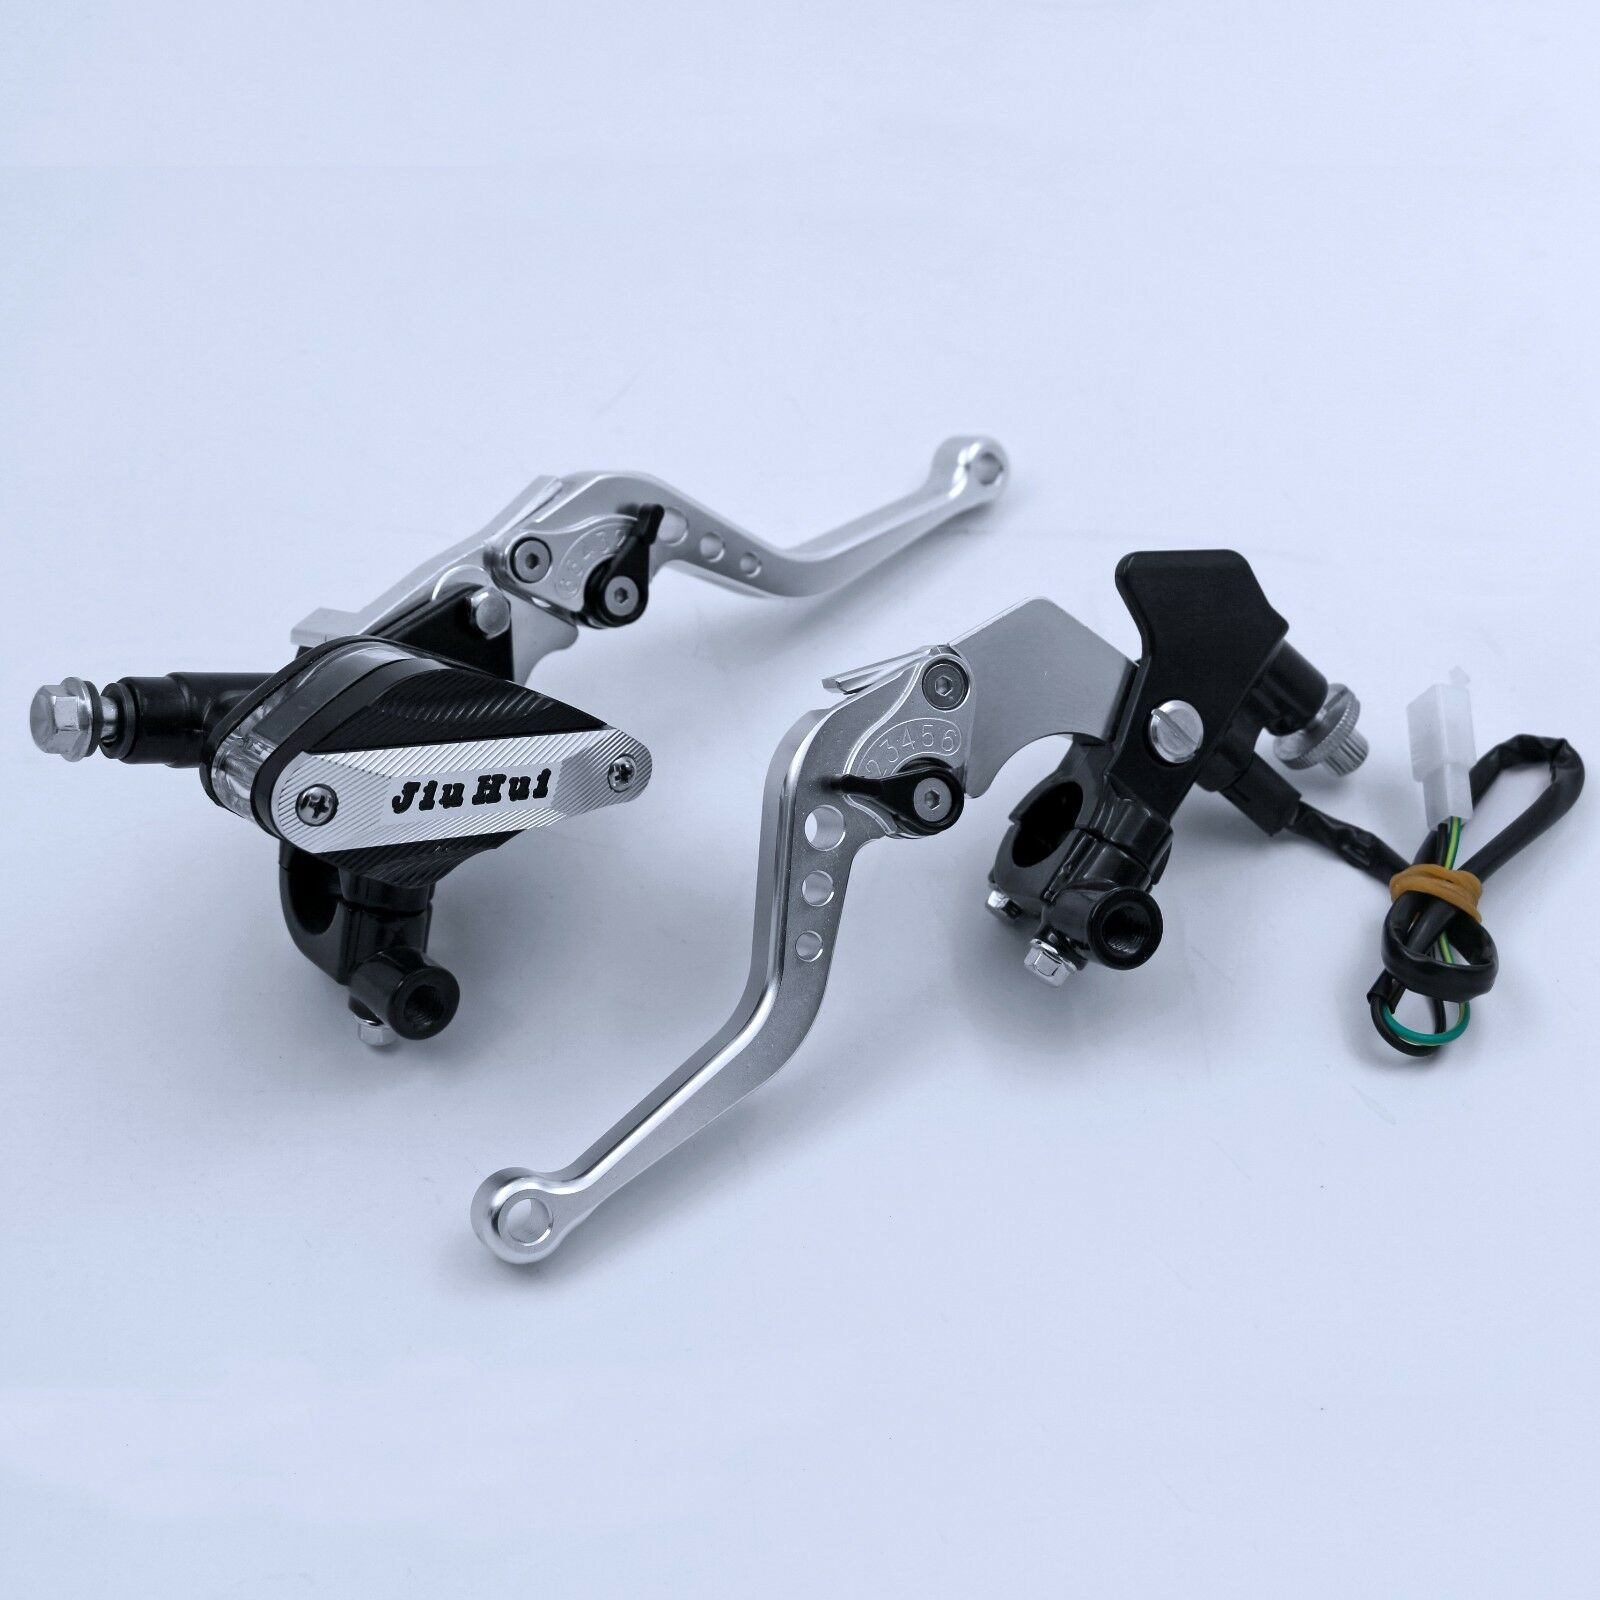 7//8/'/' Clutch Brake Levers Master Cylinder Reservoir Set For Suzuki Motorcycle